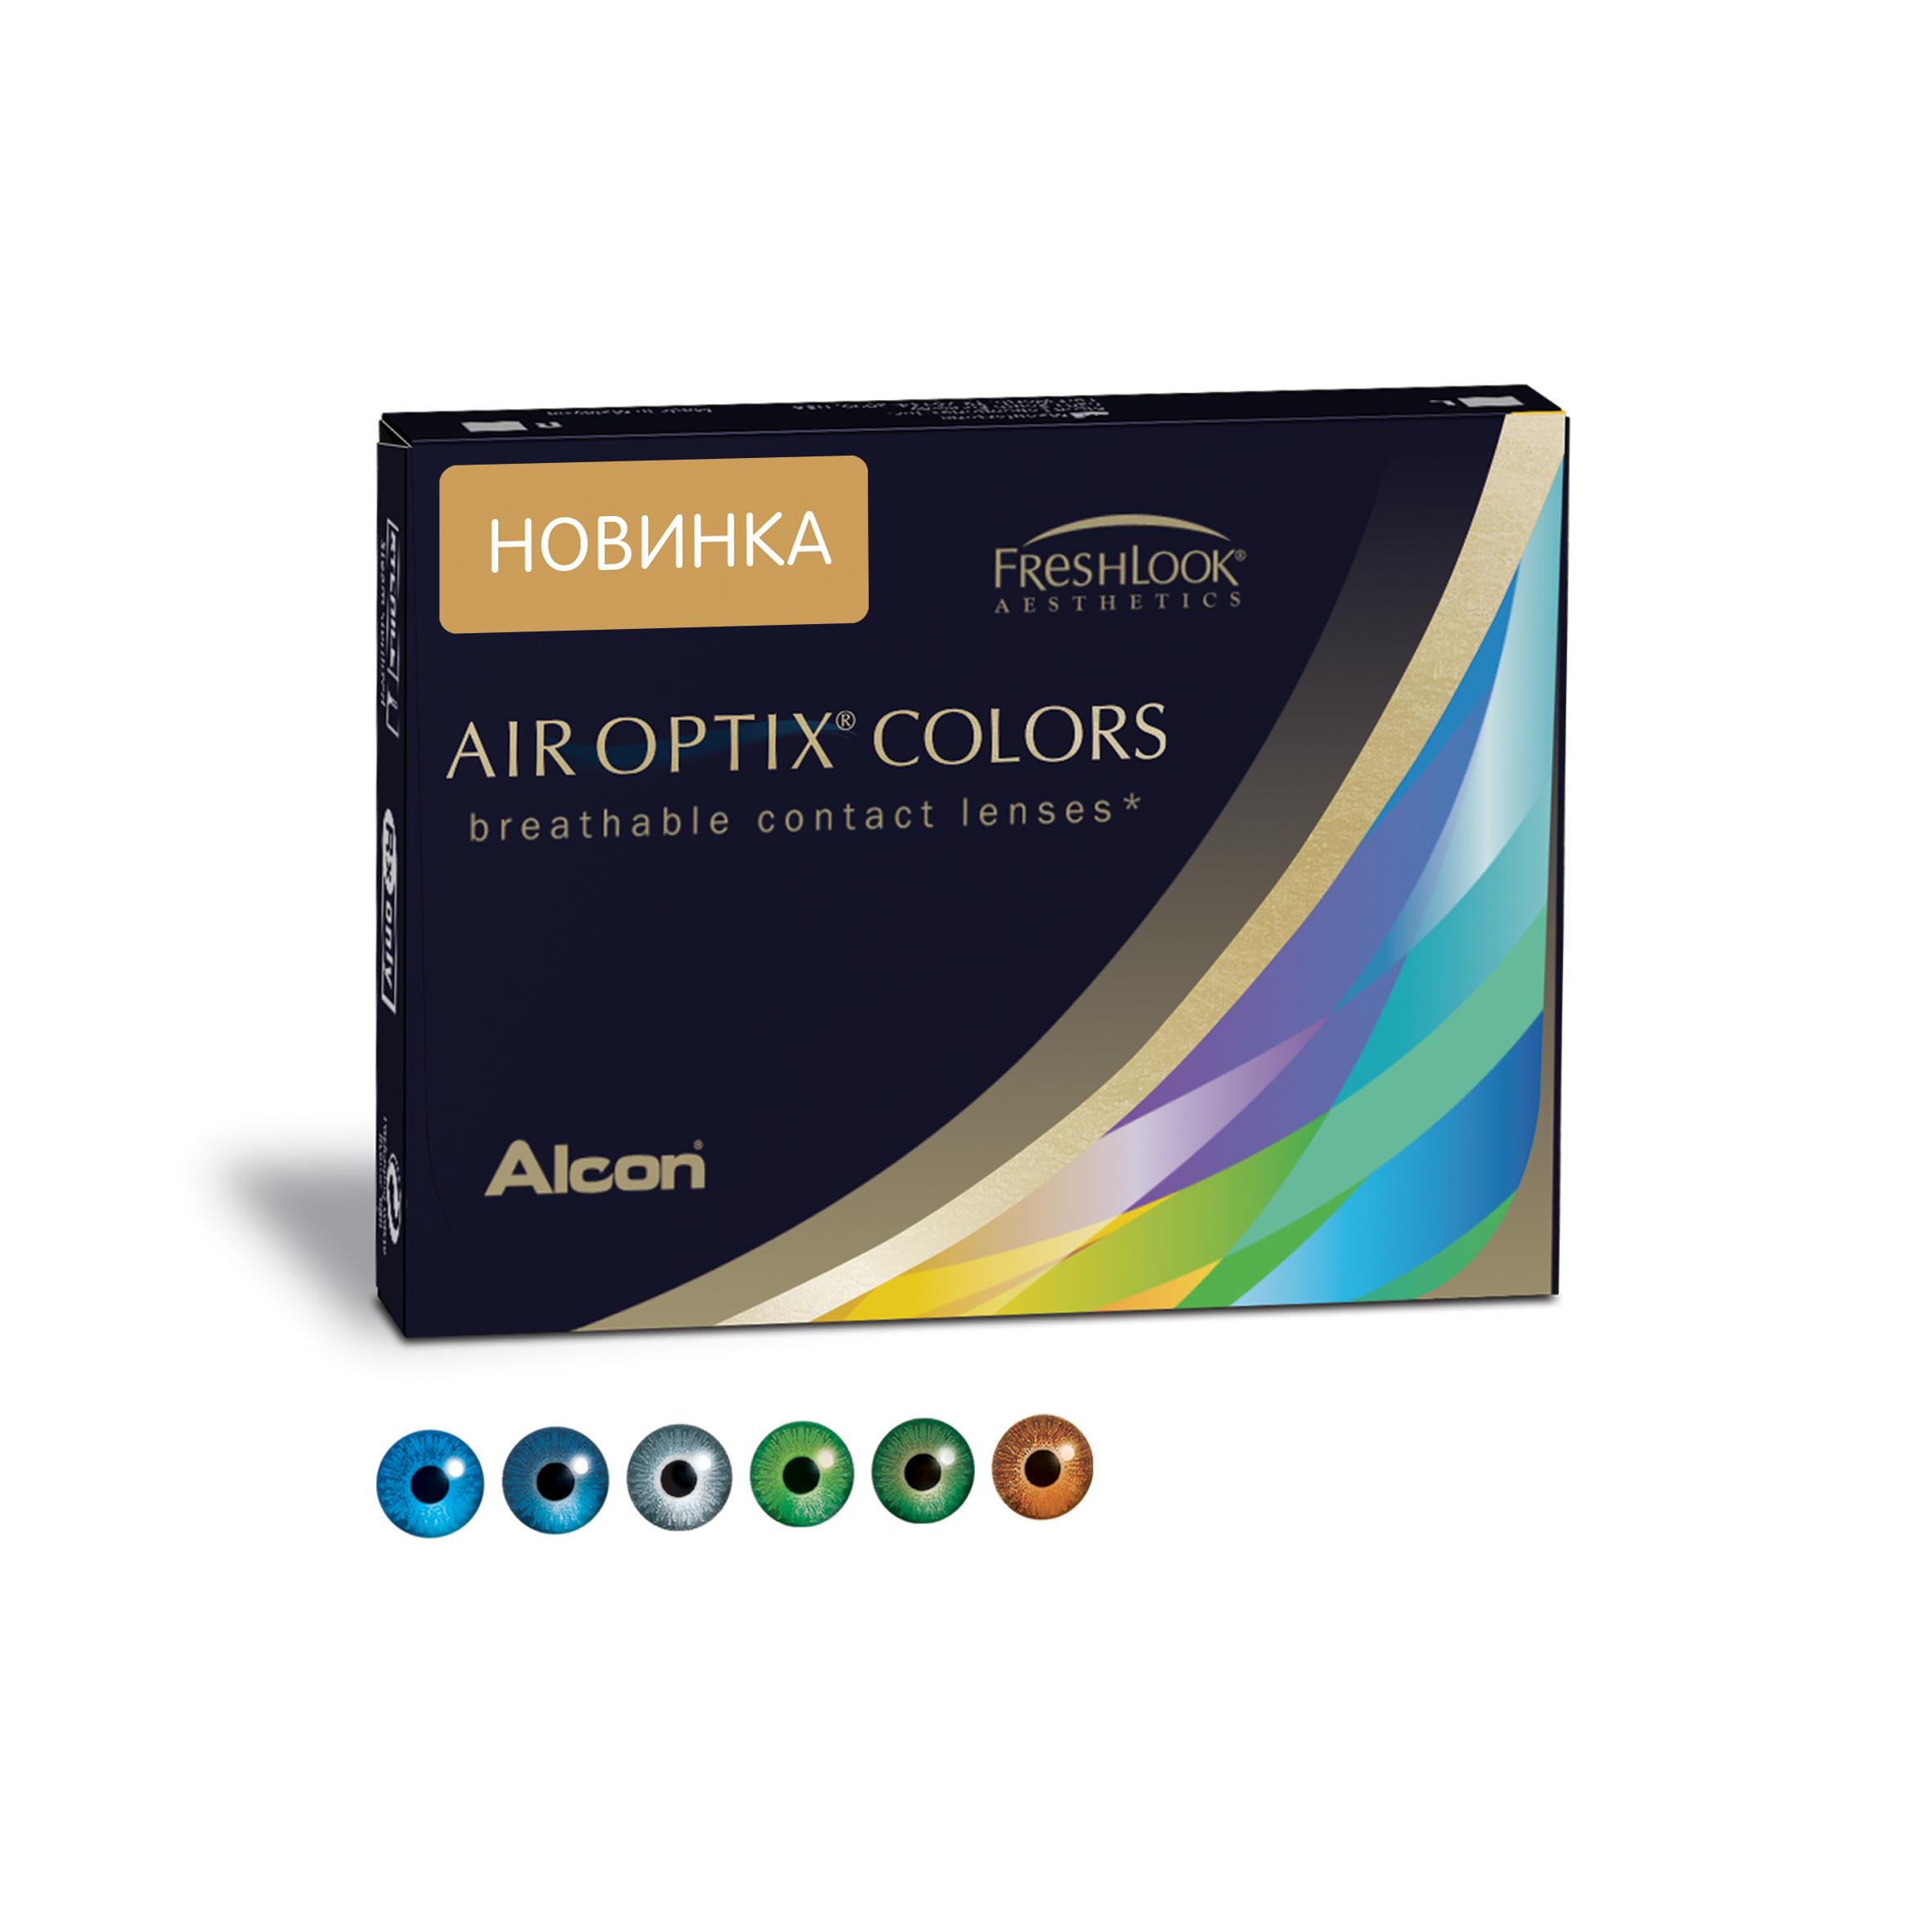 Аlcon контактные линзы Air Optix Colors 2 шт -0.25 Green31746099Мягкие контактные линзы